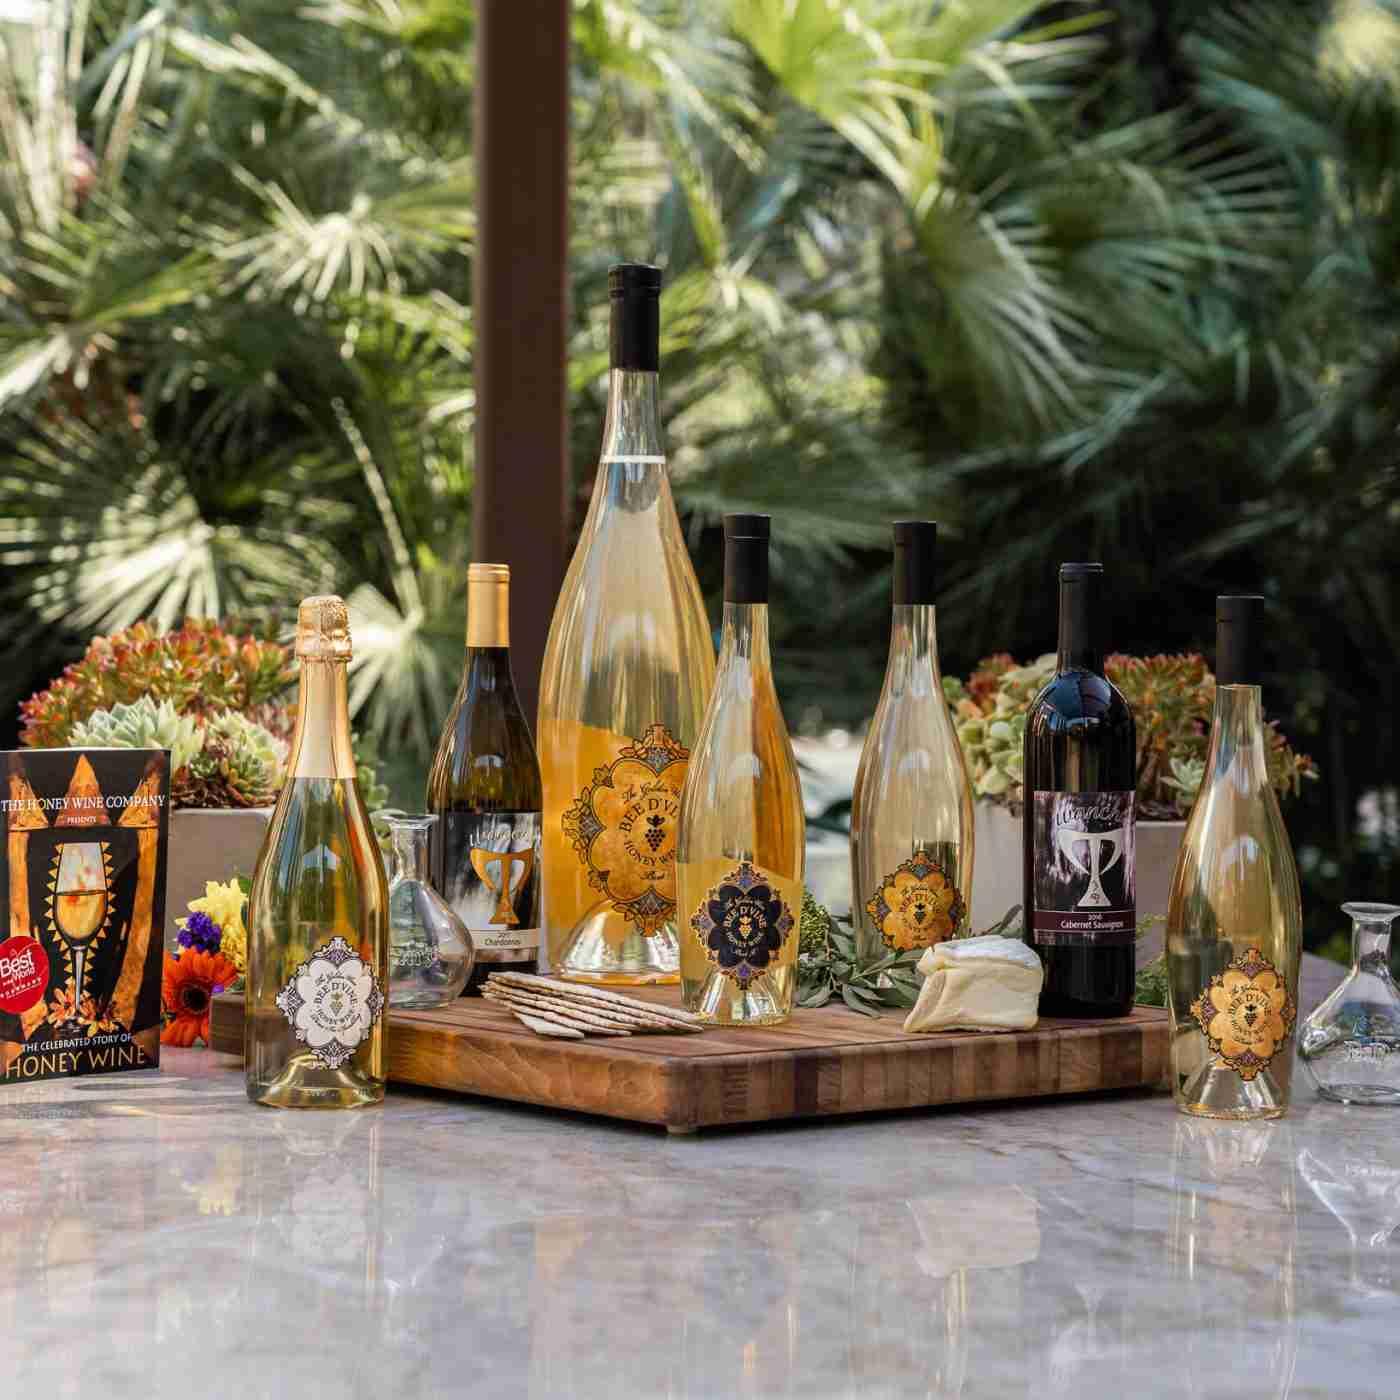 Club d'Vine Bottles